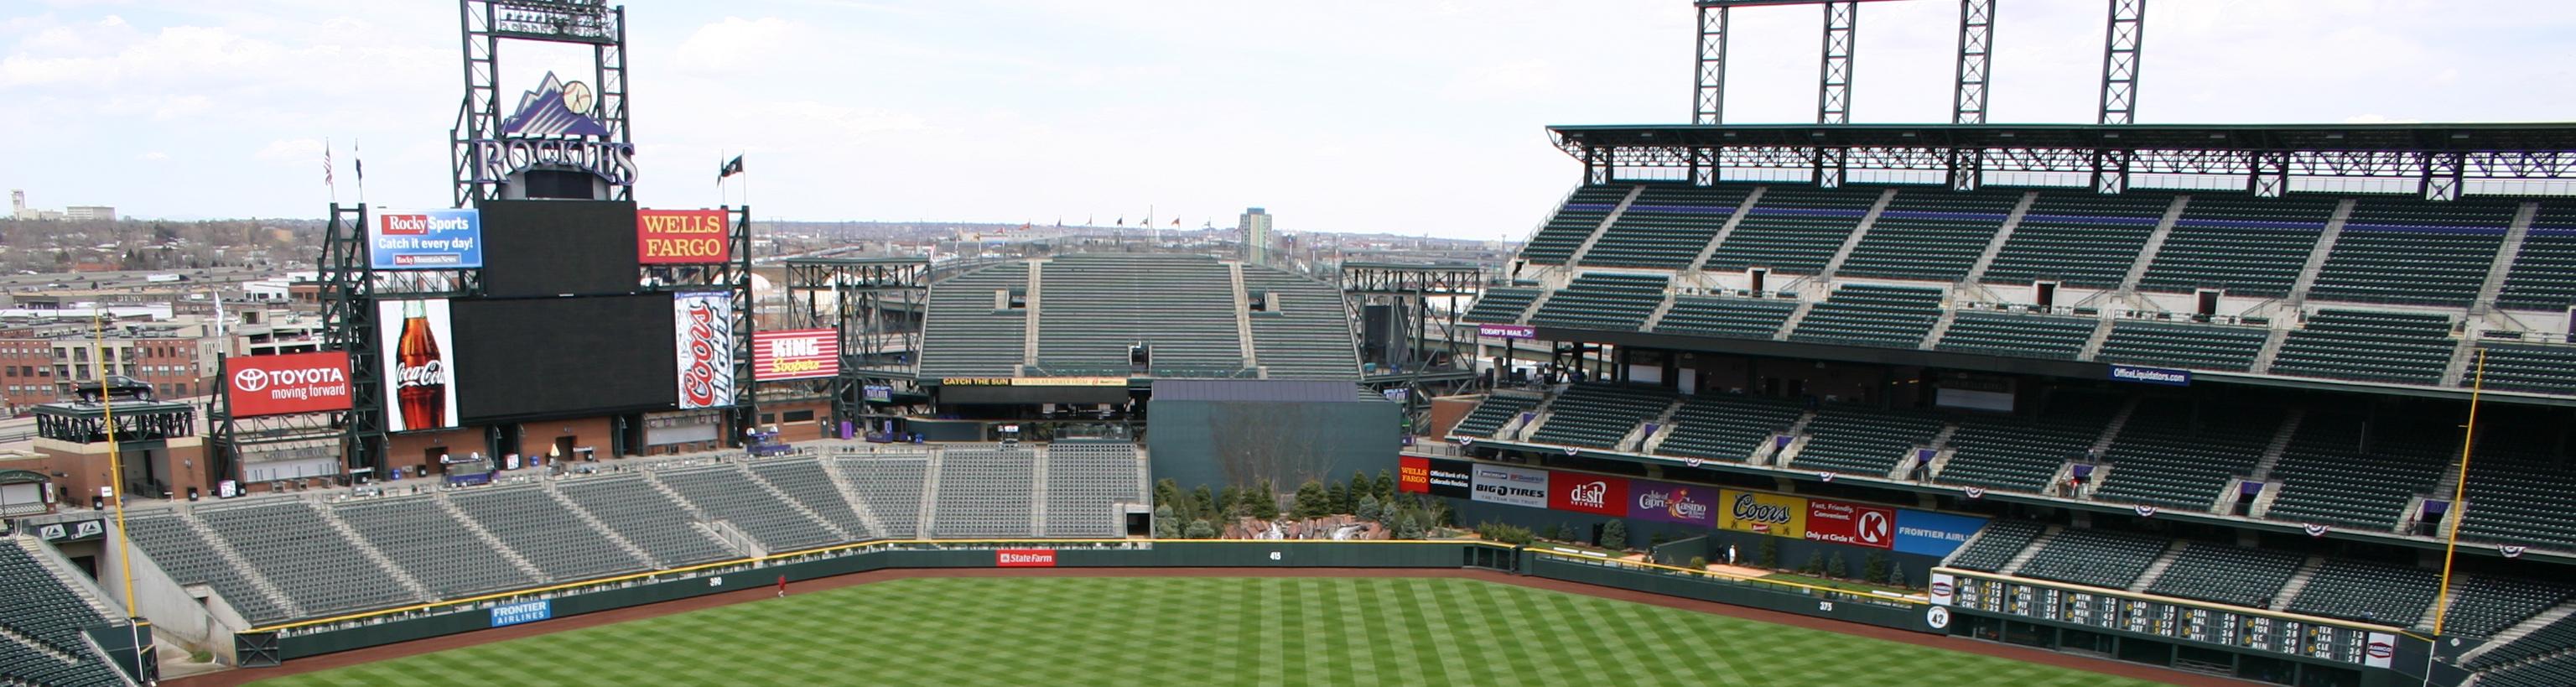 Denver baseball tours,rockies,coors field,baseball stadium tours,baseball vacation packages